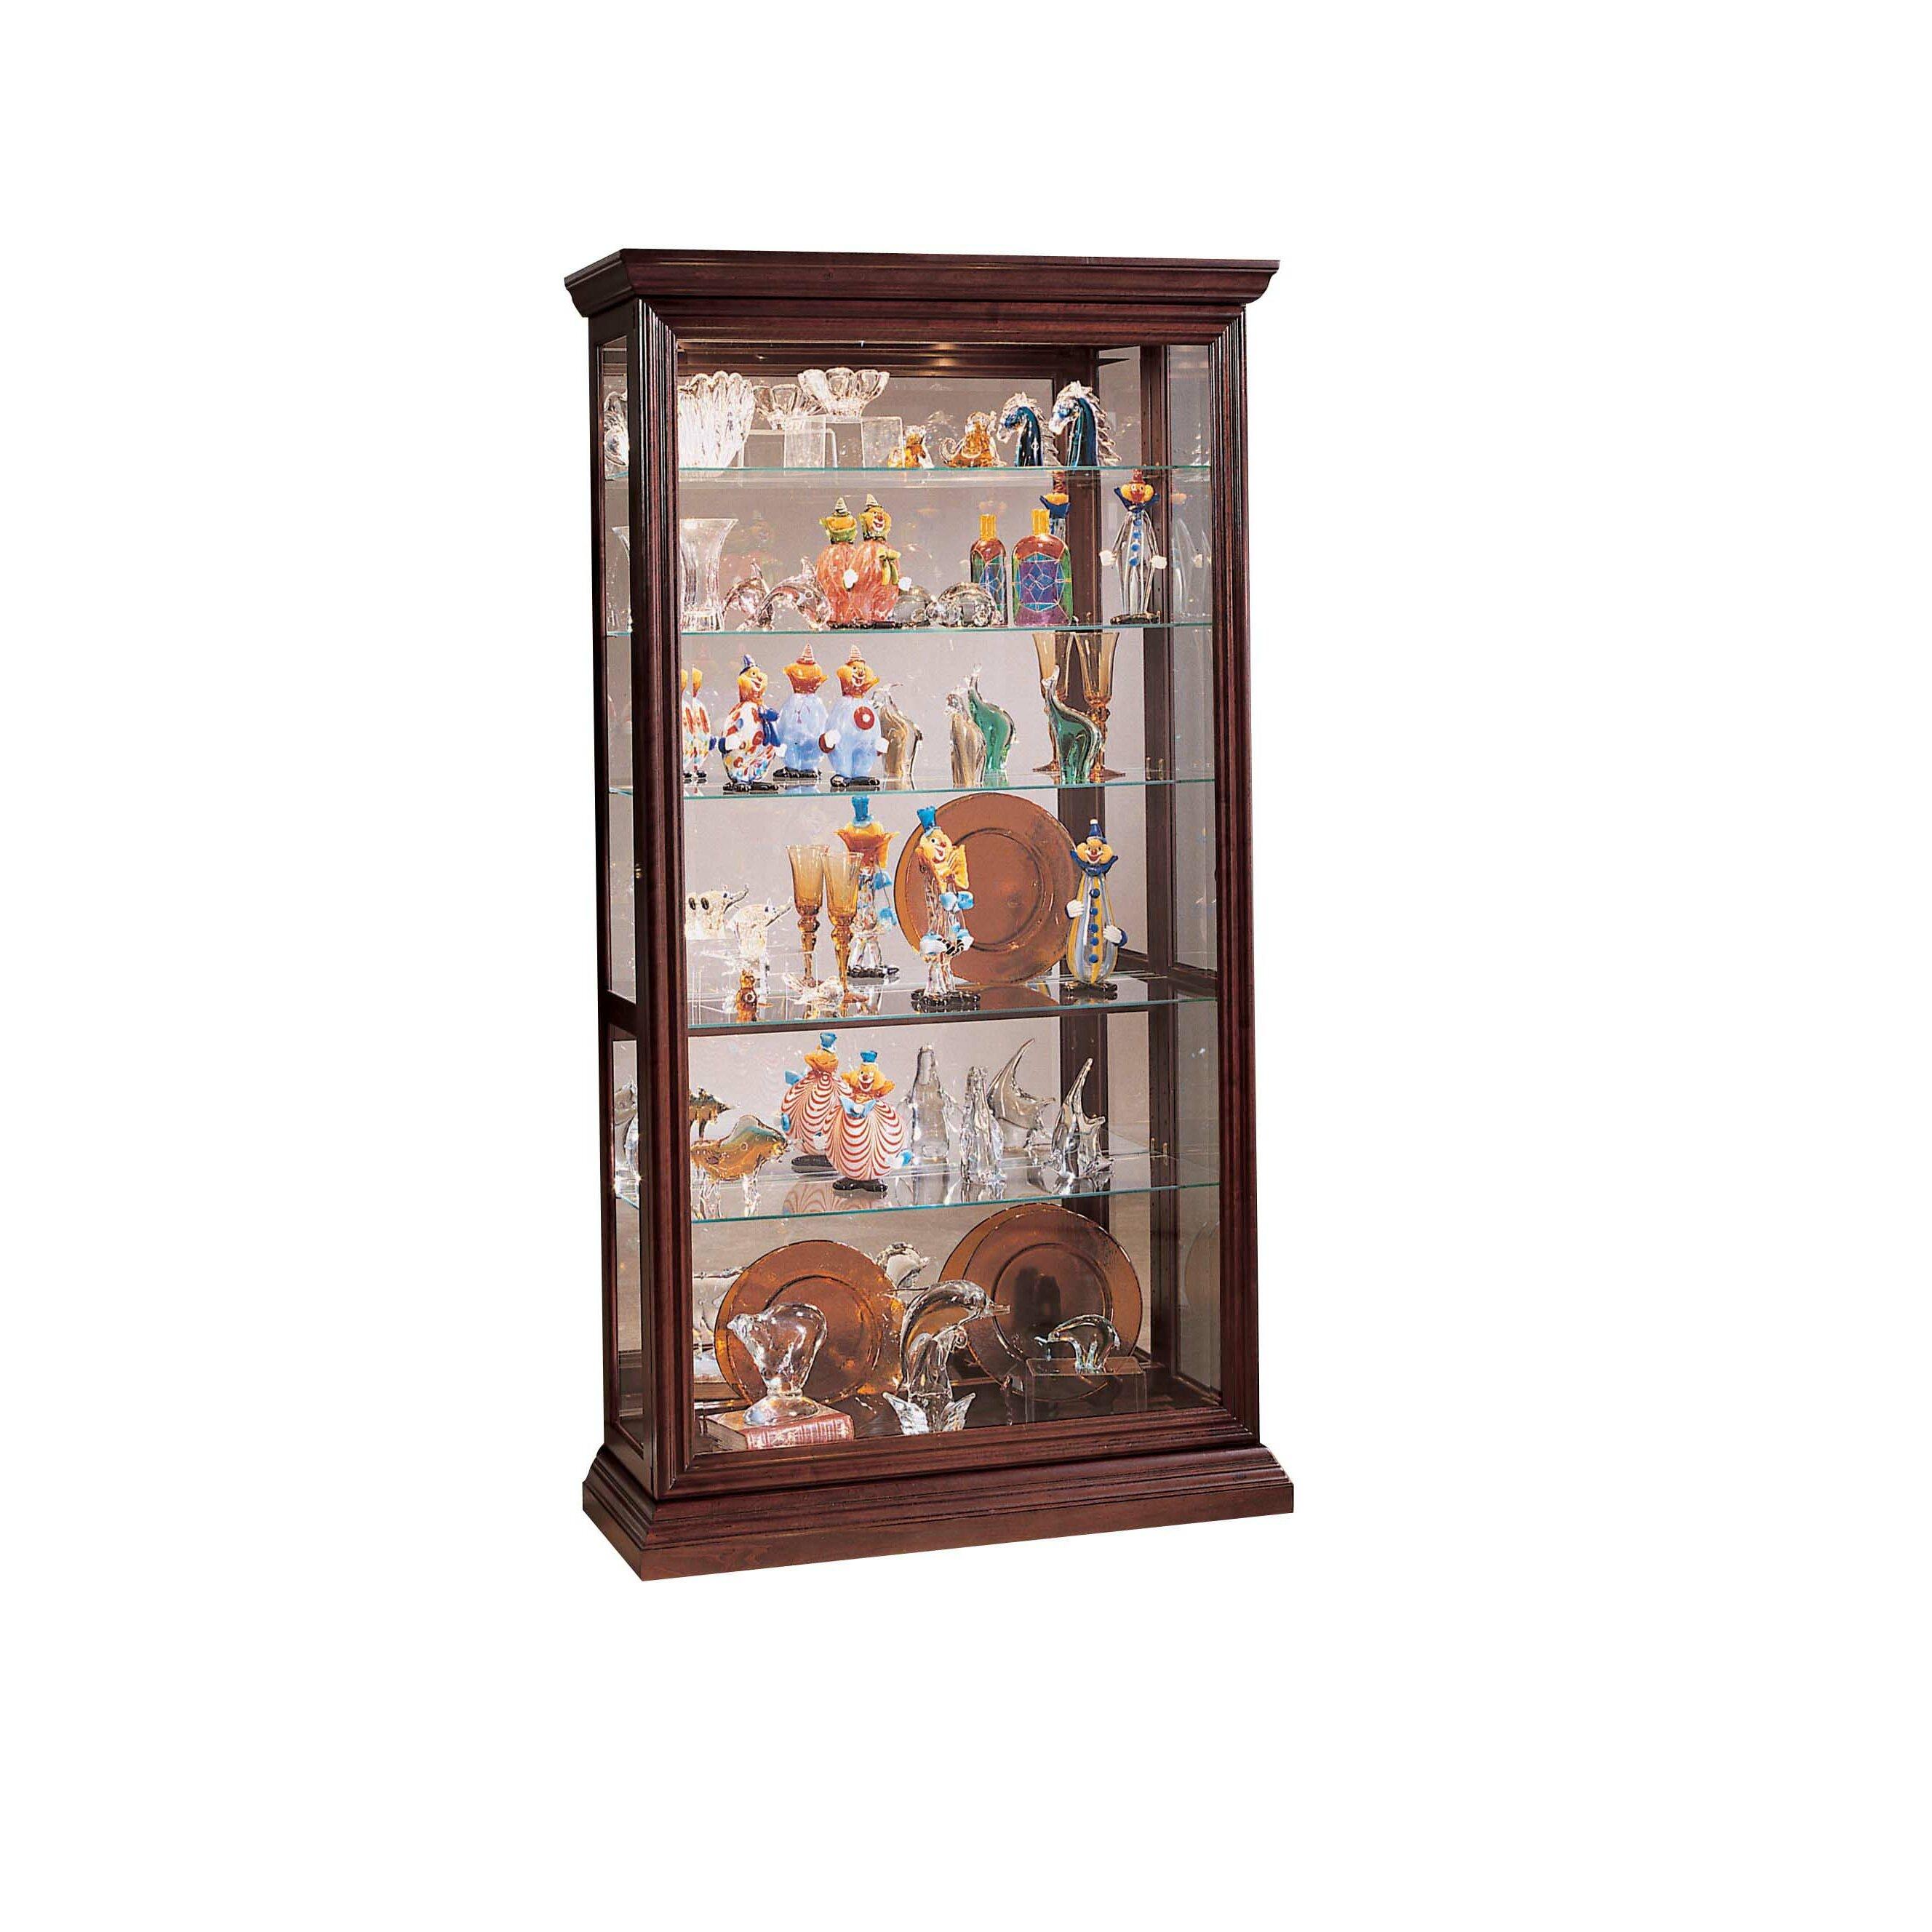 Pulaski keepsakes eden curio cabinet reviews wayfair for Pulaski furniture